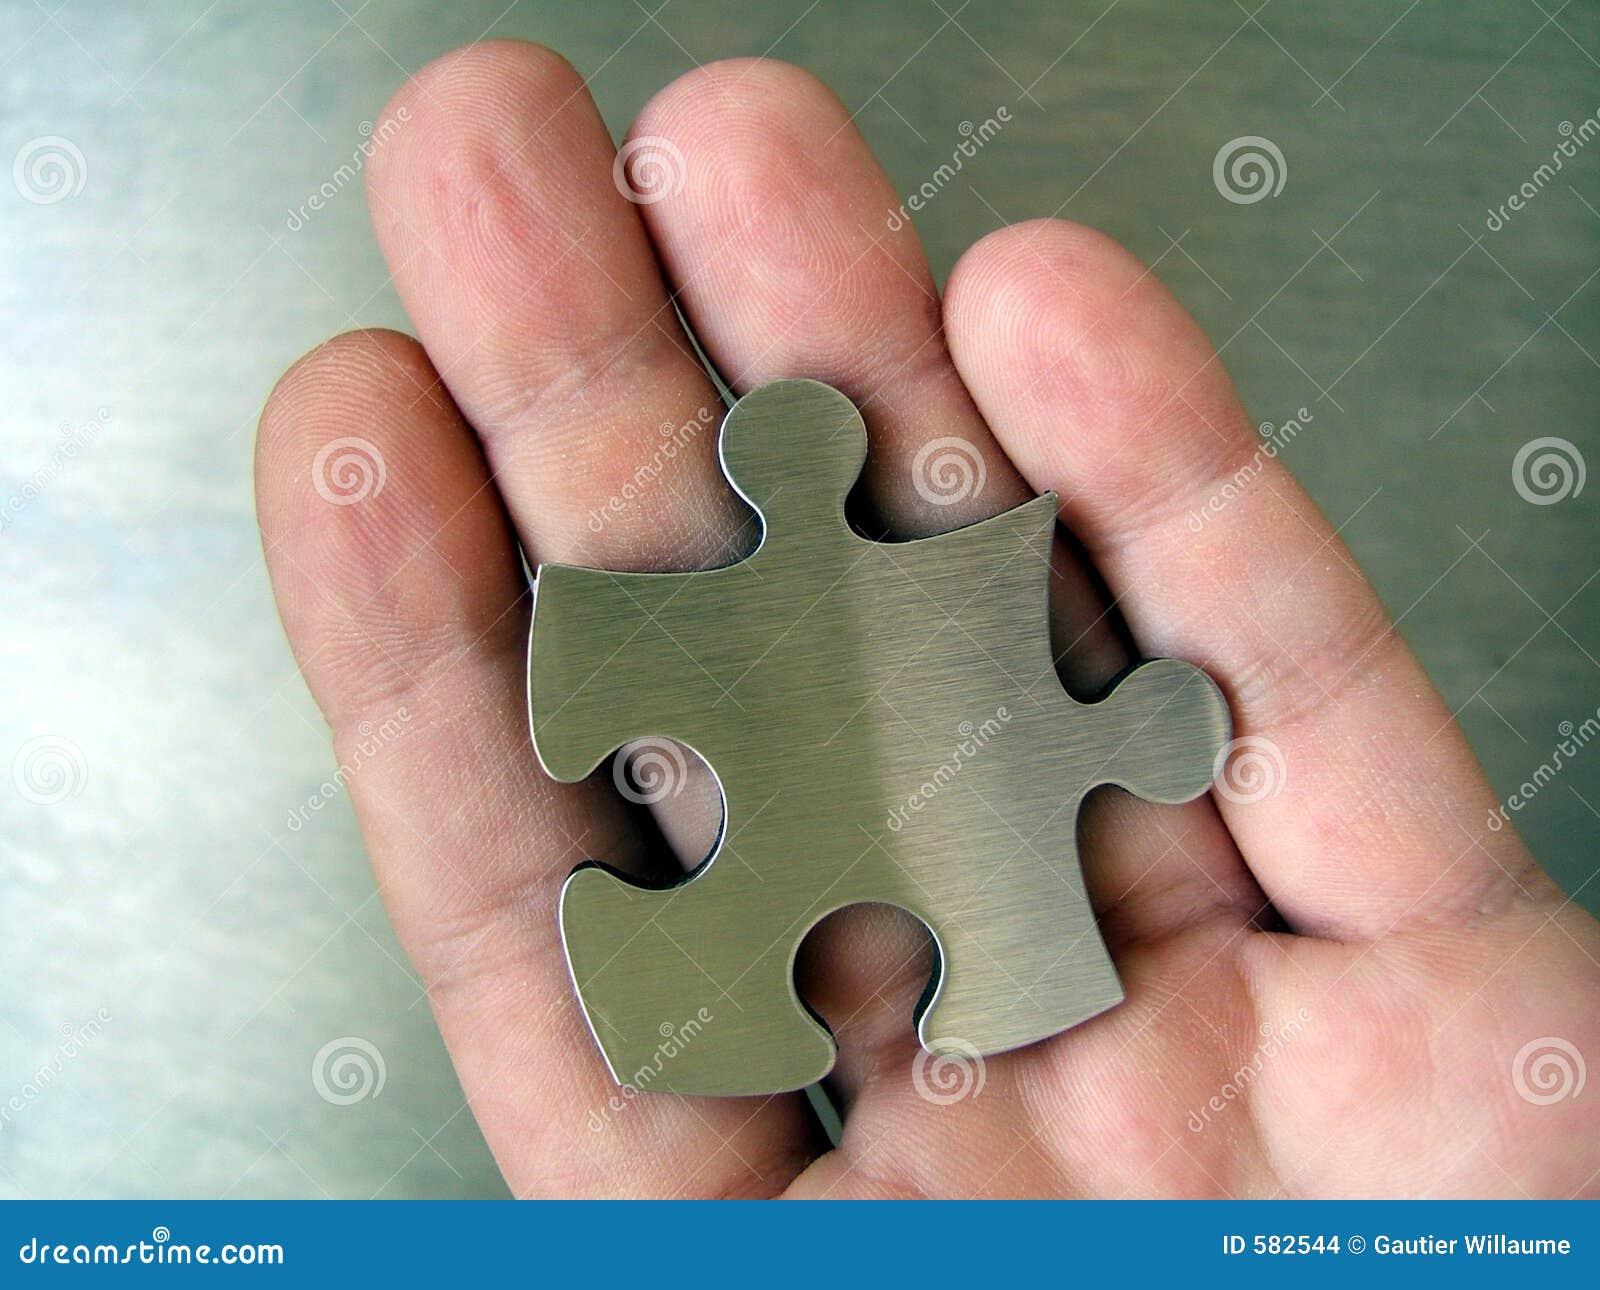 Jigsaw in Hand